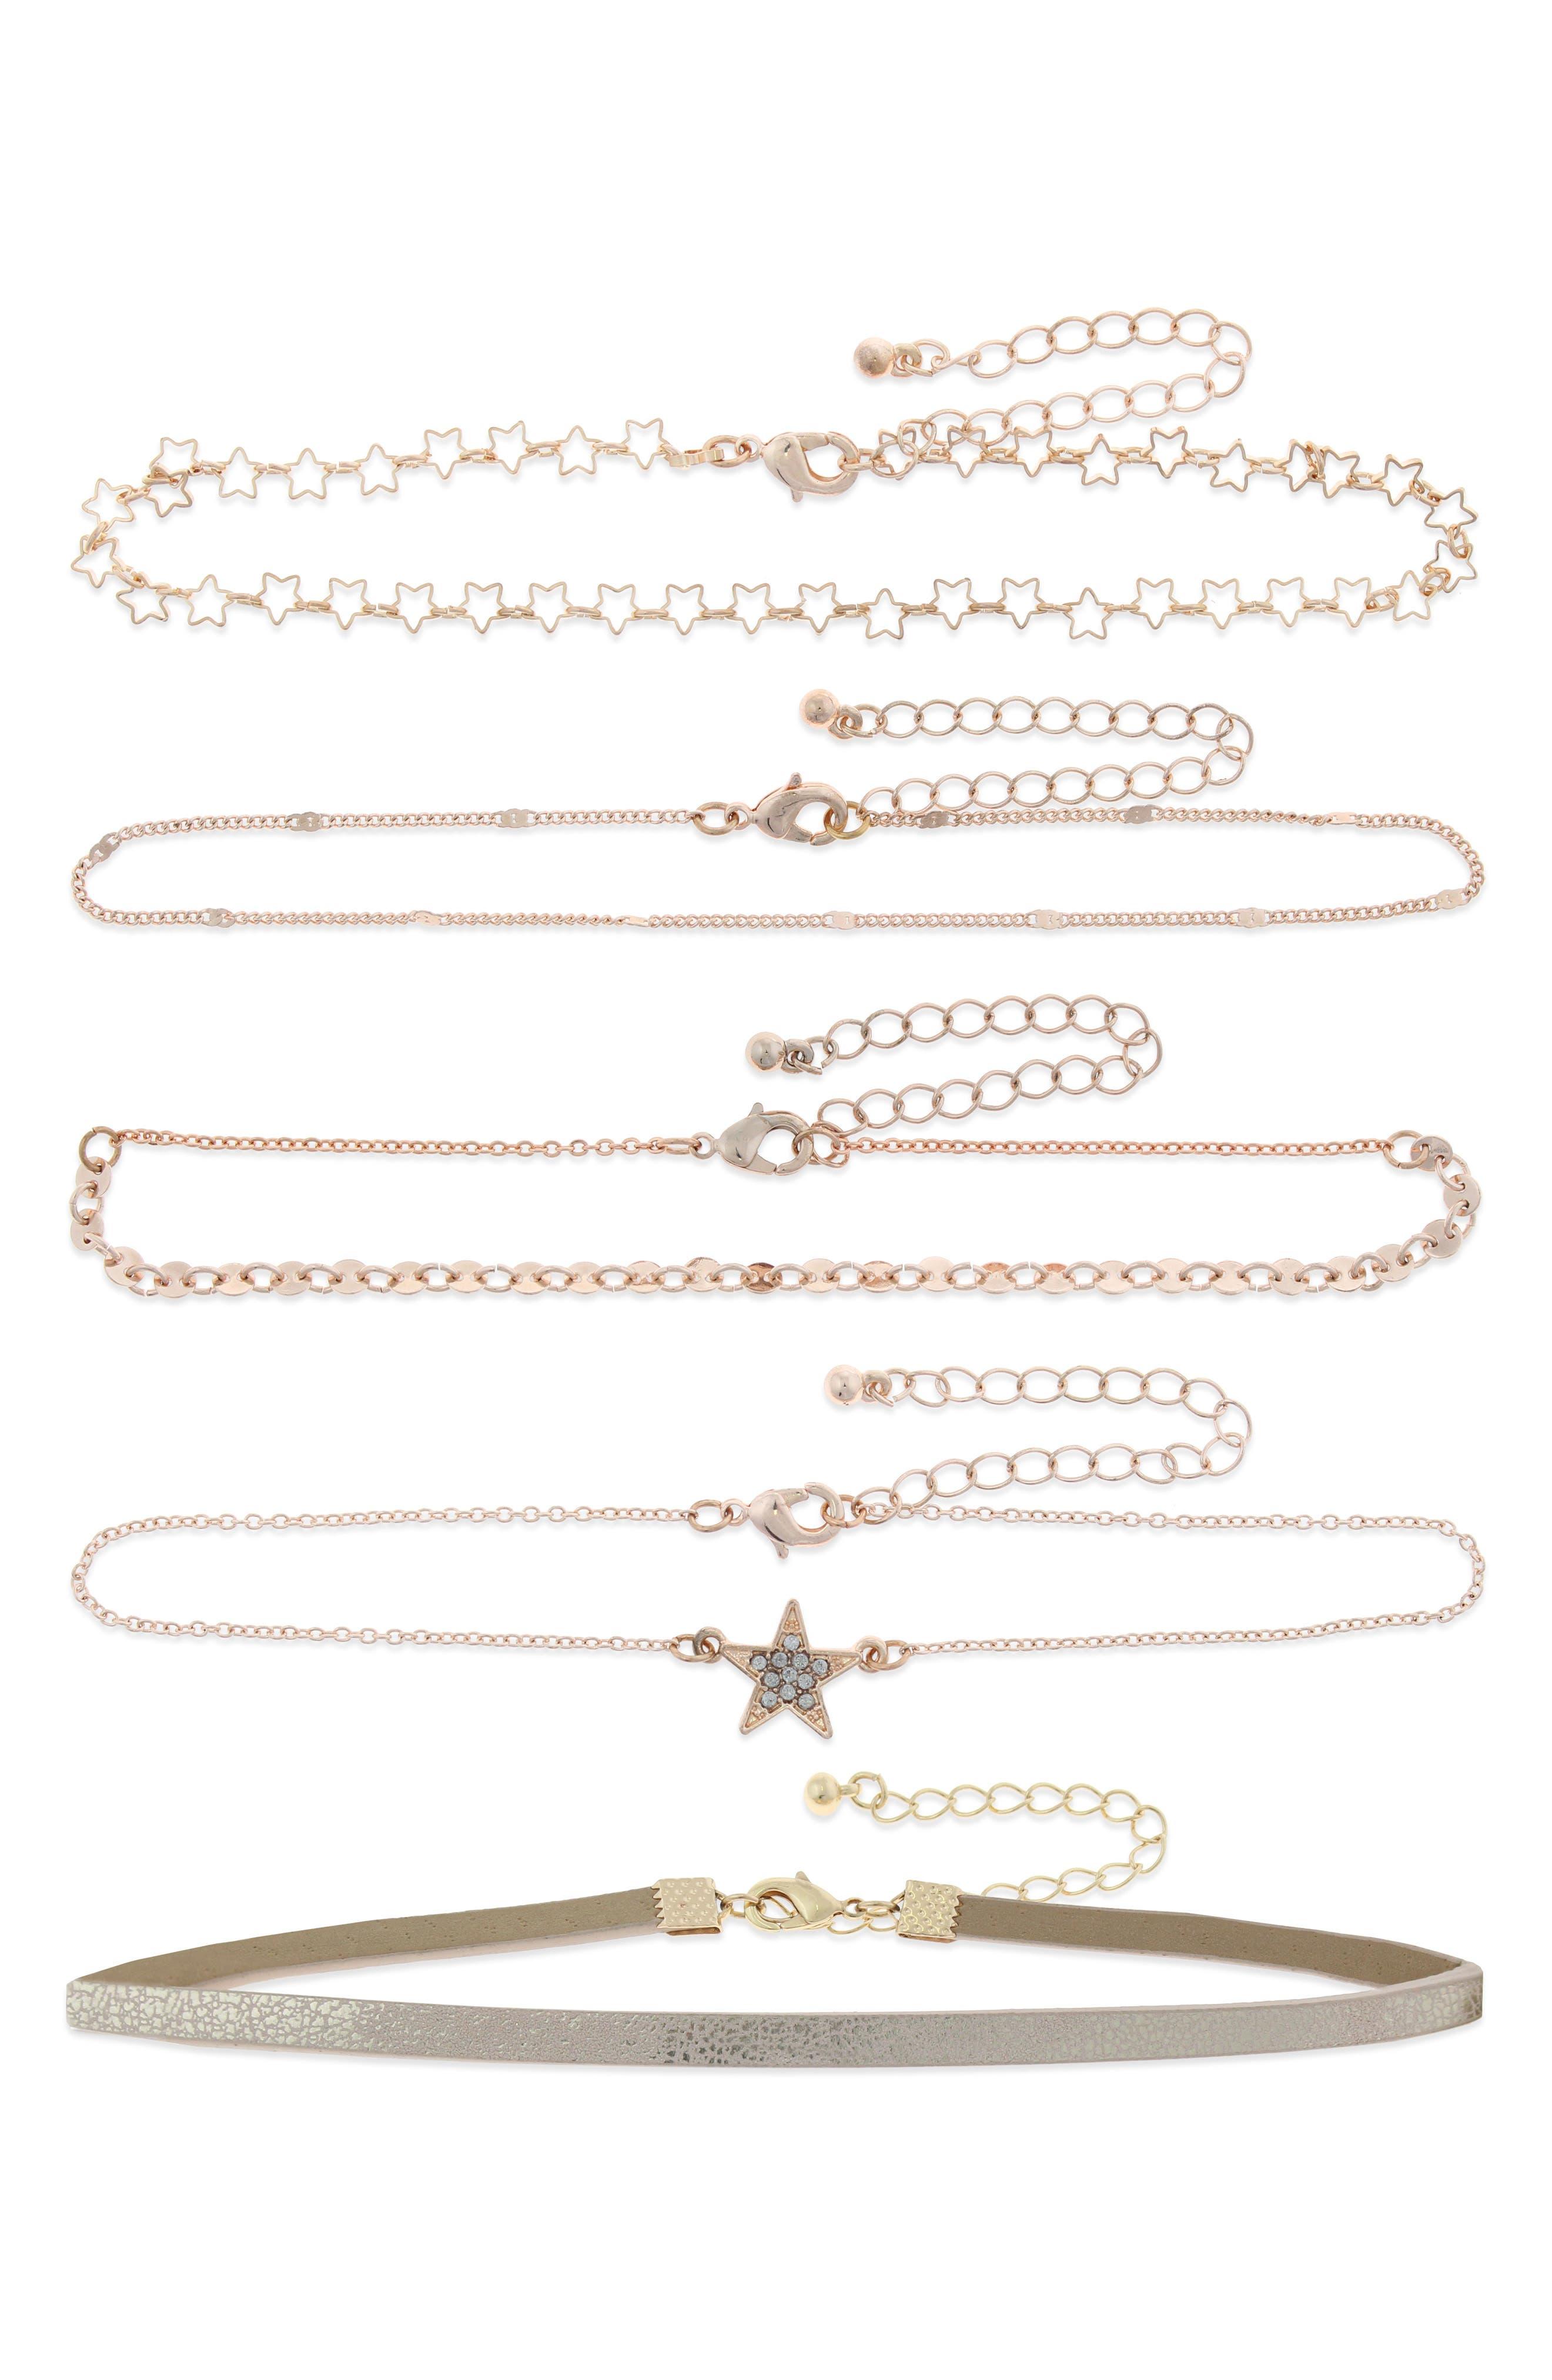 Set of 5 Choker Necklaces,                         Main,                         color, 712